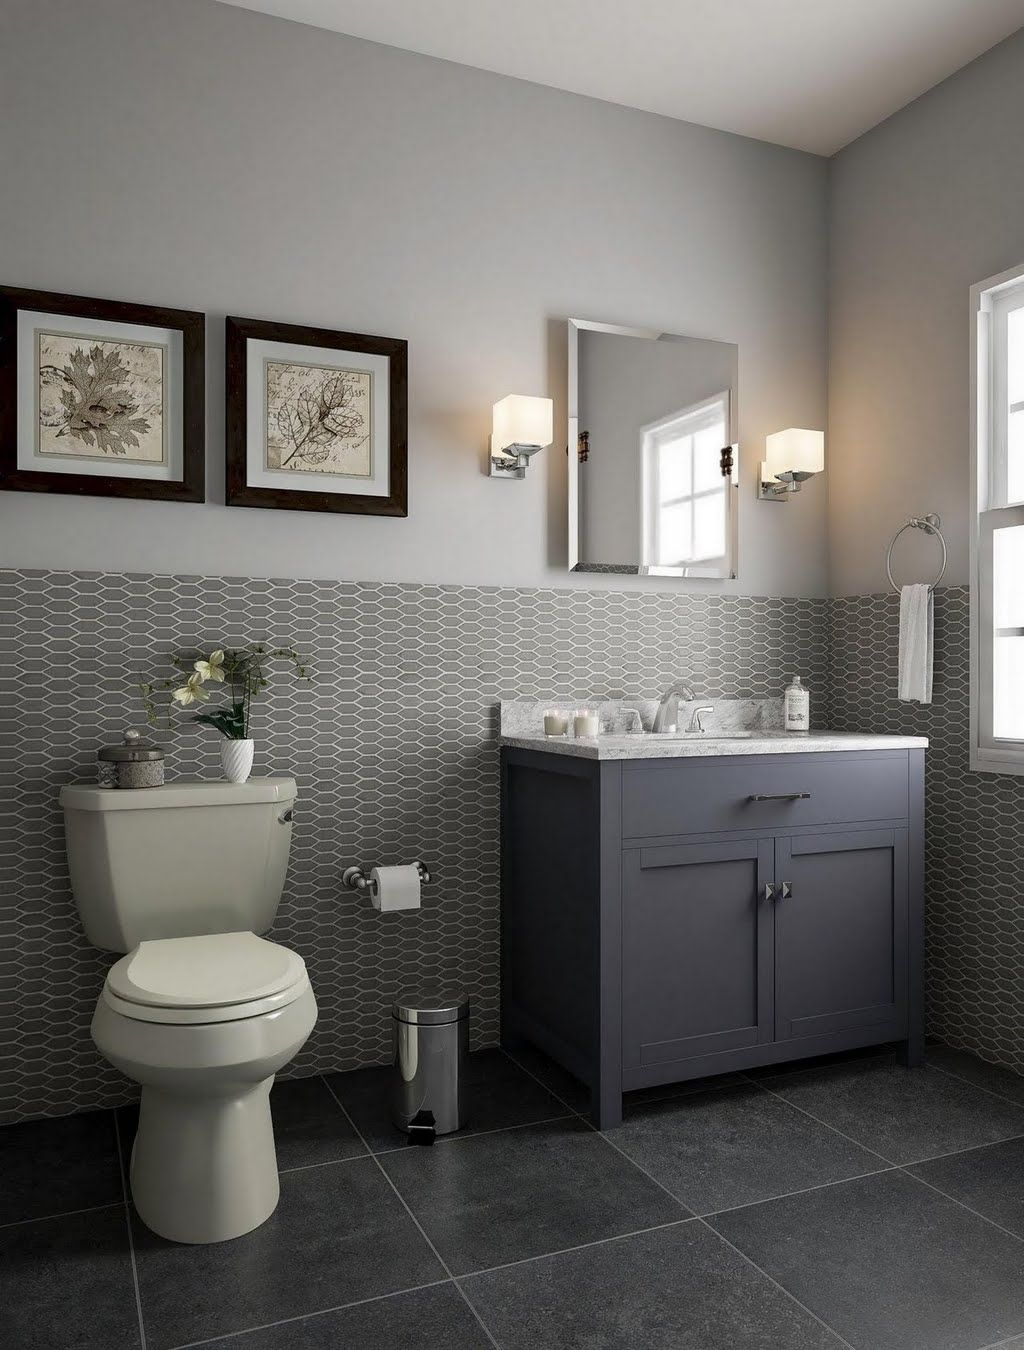 Gray Bathroom With Wainscoting Bathroom The Home Depot Small Bathroom Remodel Small Bathroom Ideas On A Budget Home Depot Bathroom